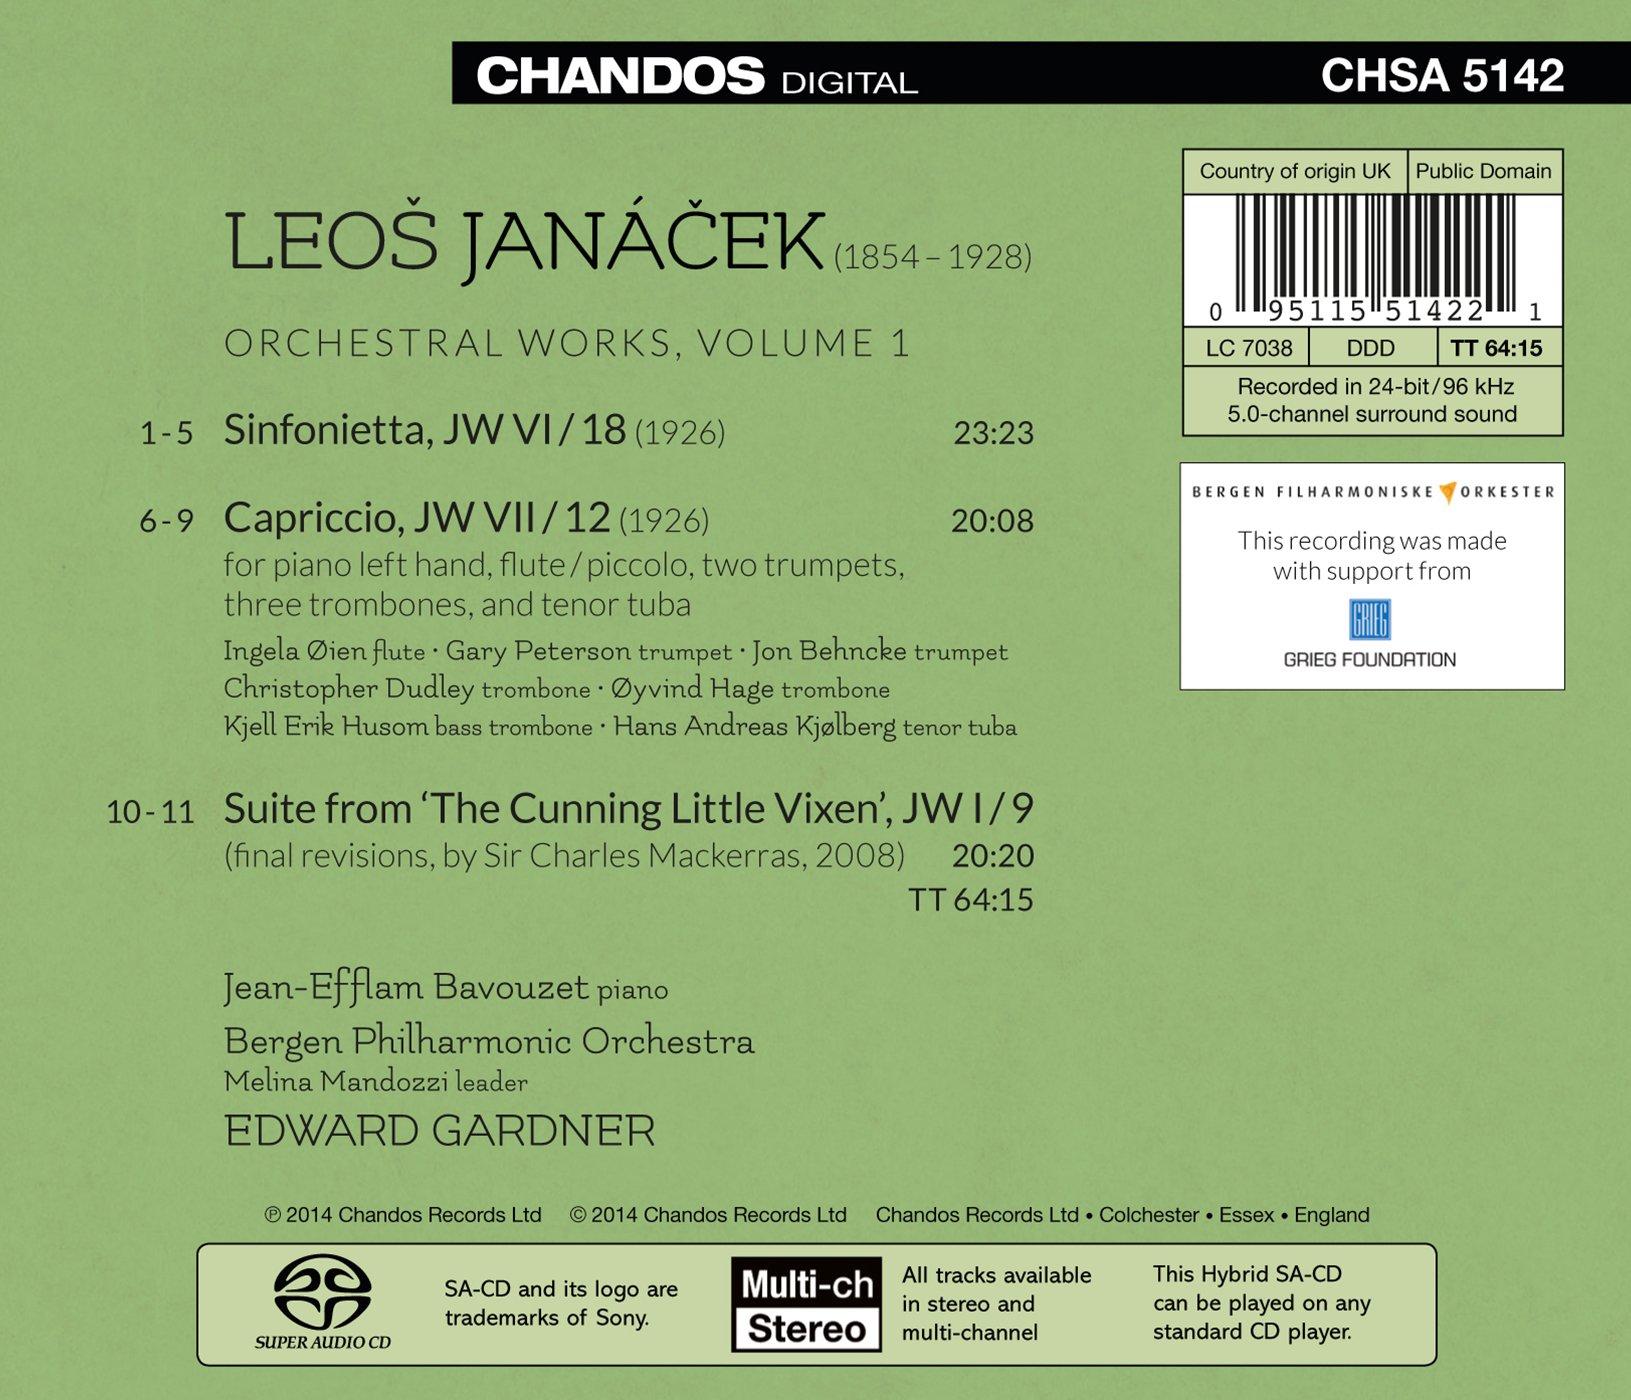 Janacek: Orchestral Works, Vol.1